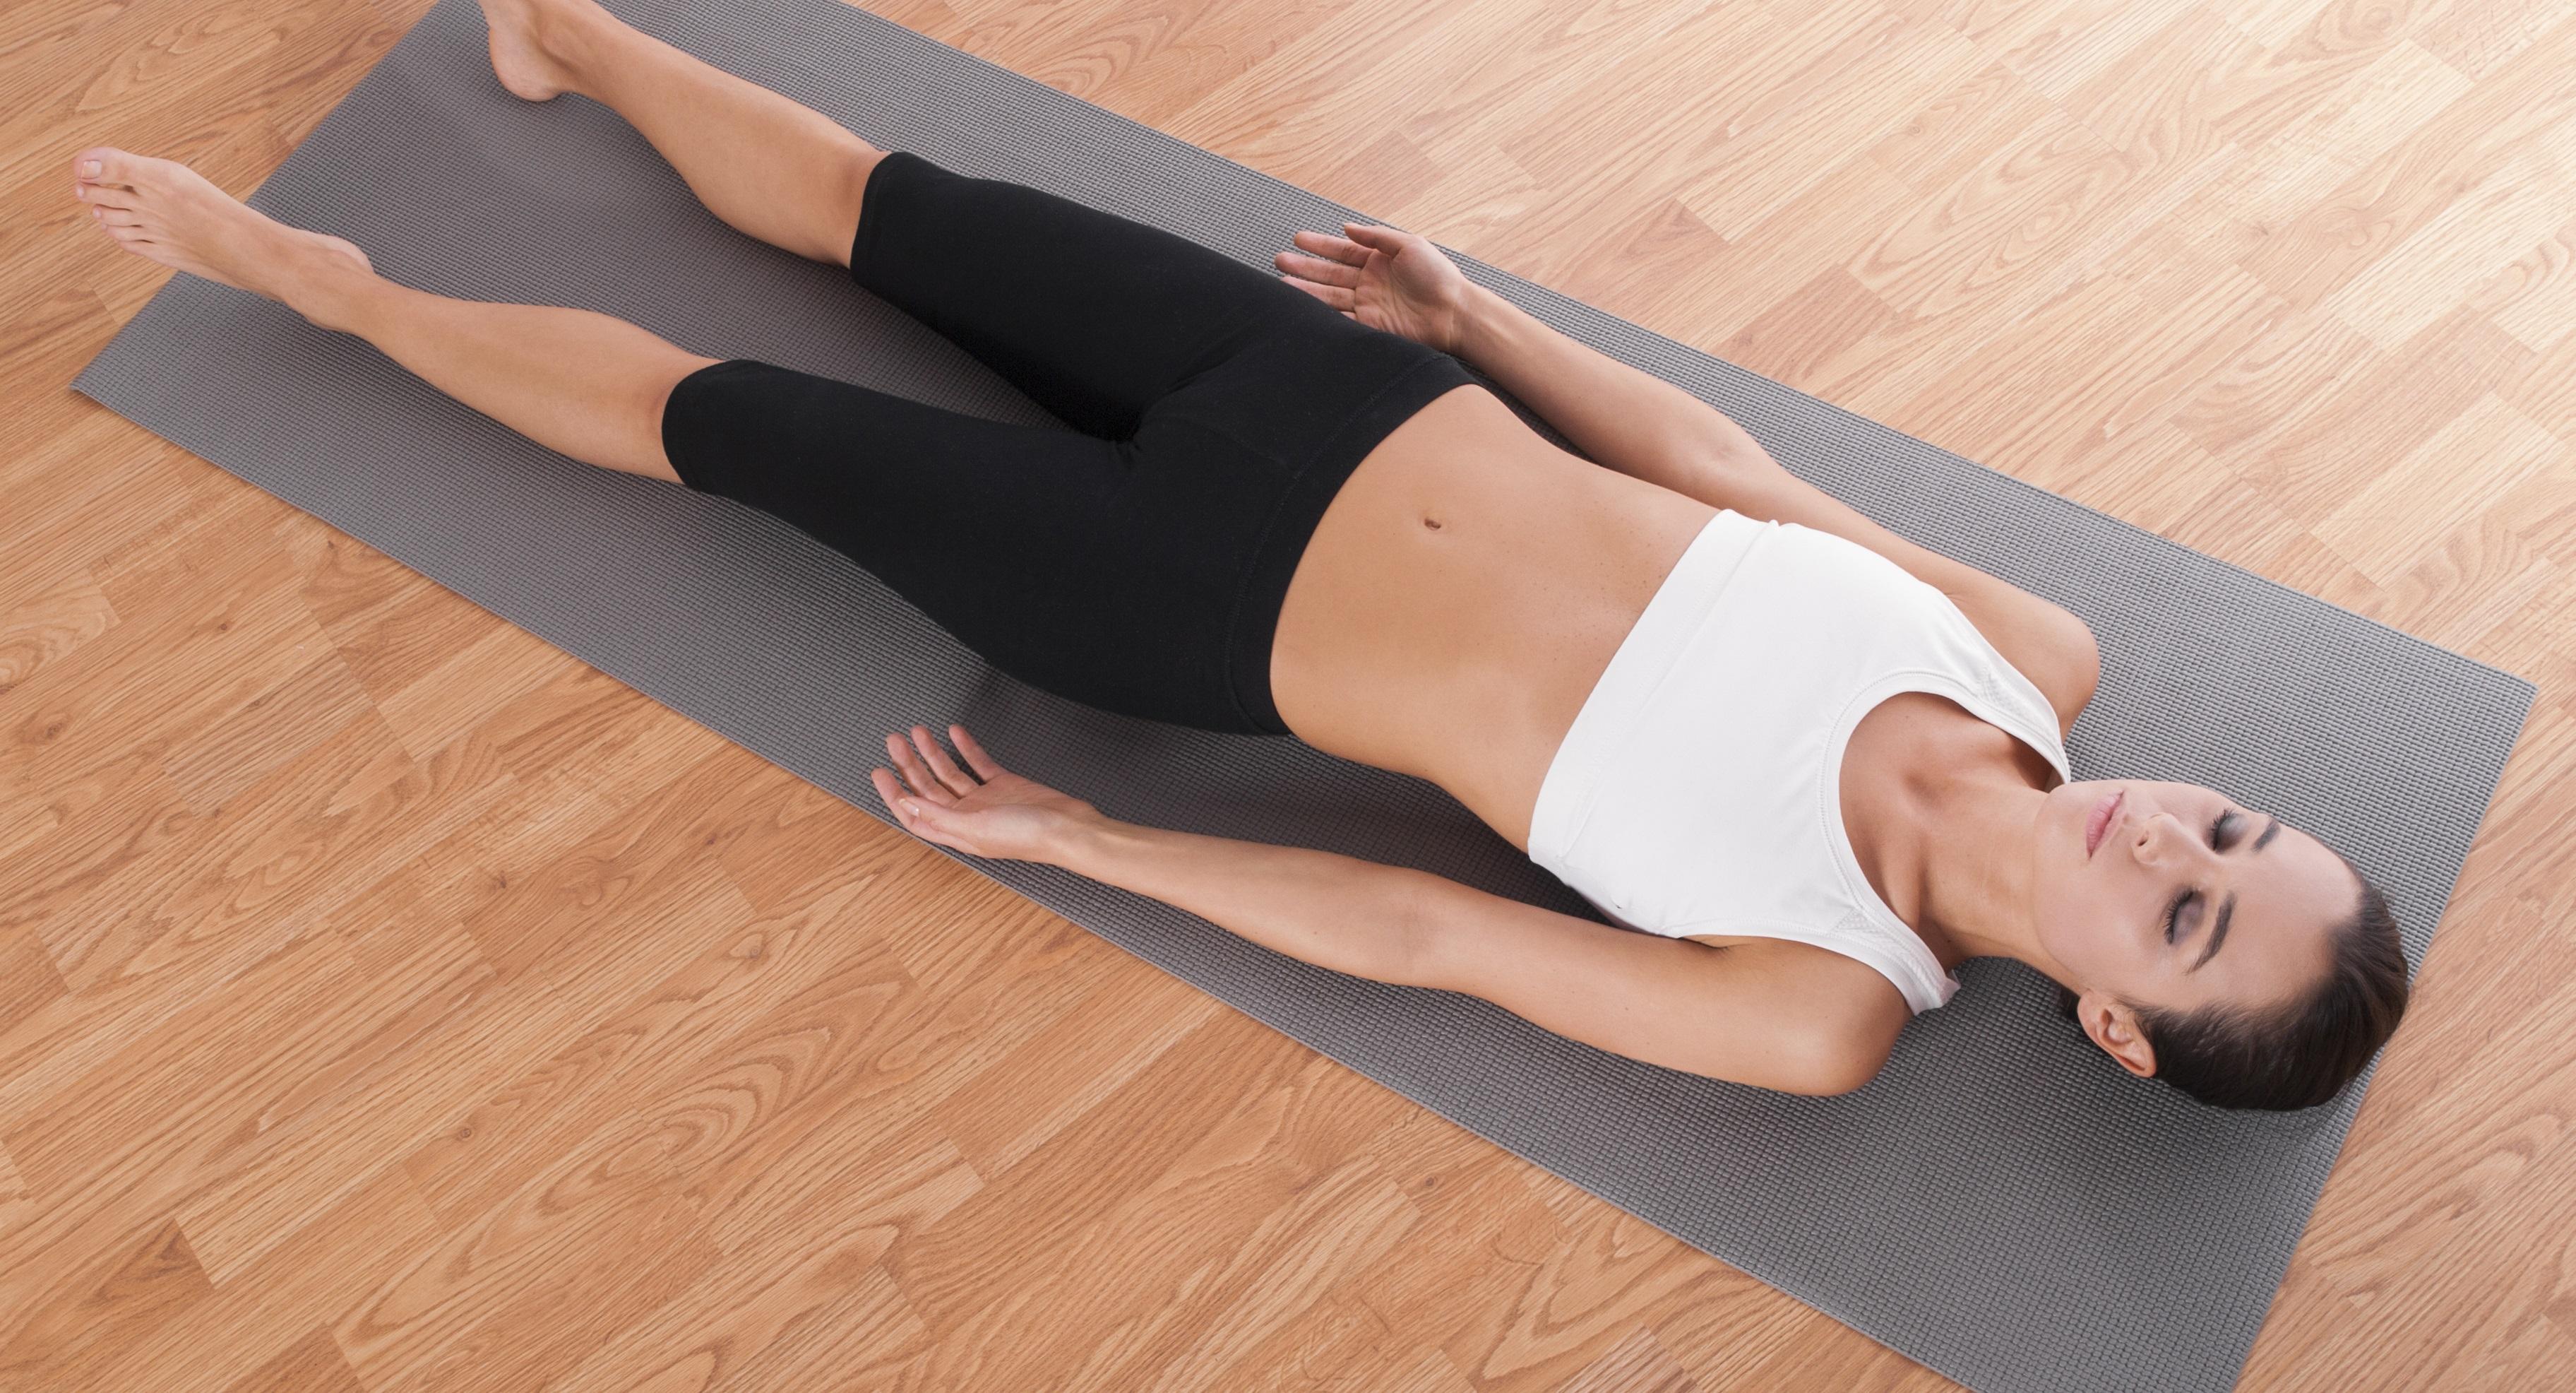 autogenes training physiotherapie silke med henneberg. Black Bedroom Furniture Sets. Home Design Ideas